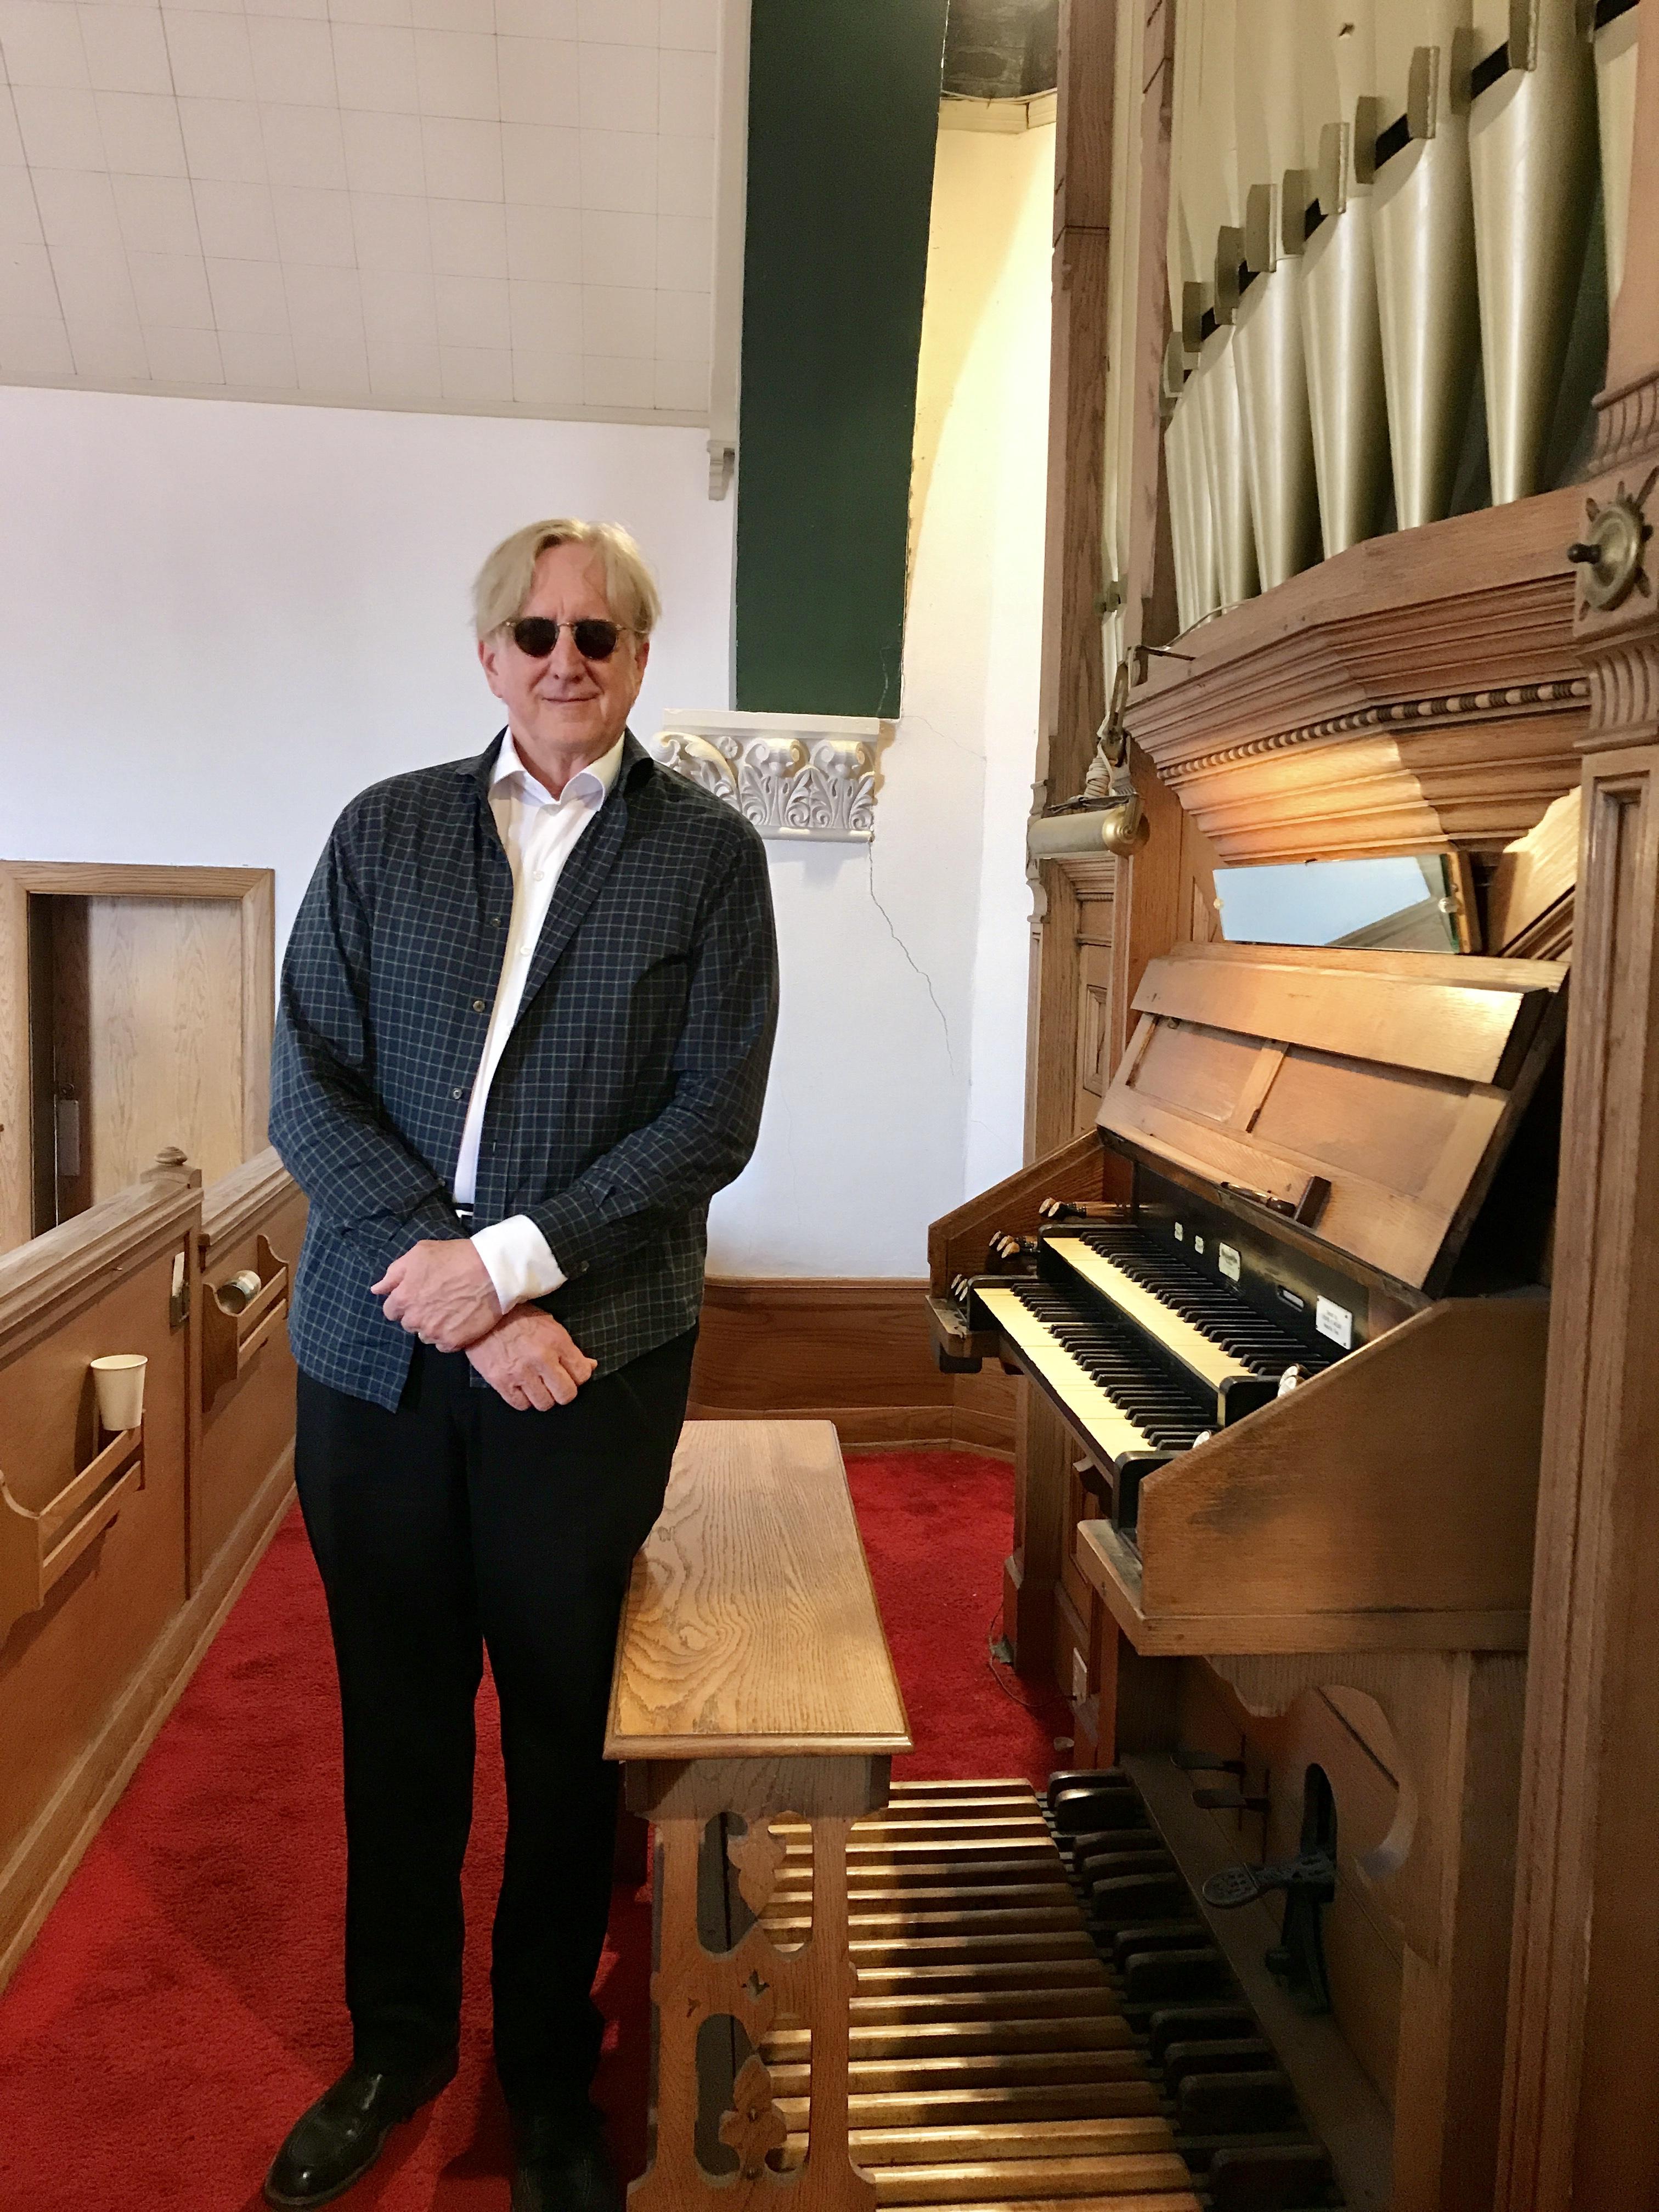 T Bone Burnett and pipe organ